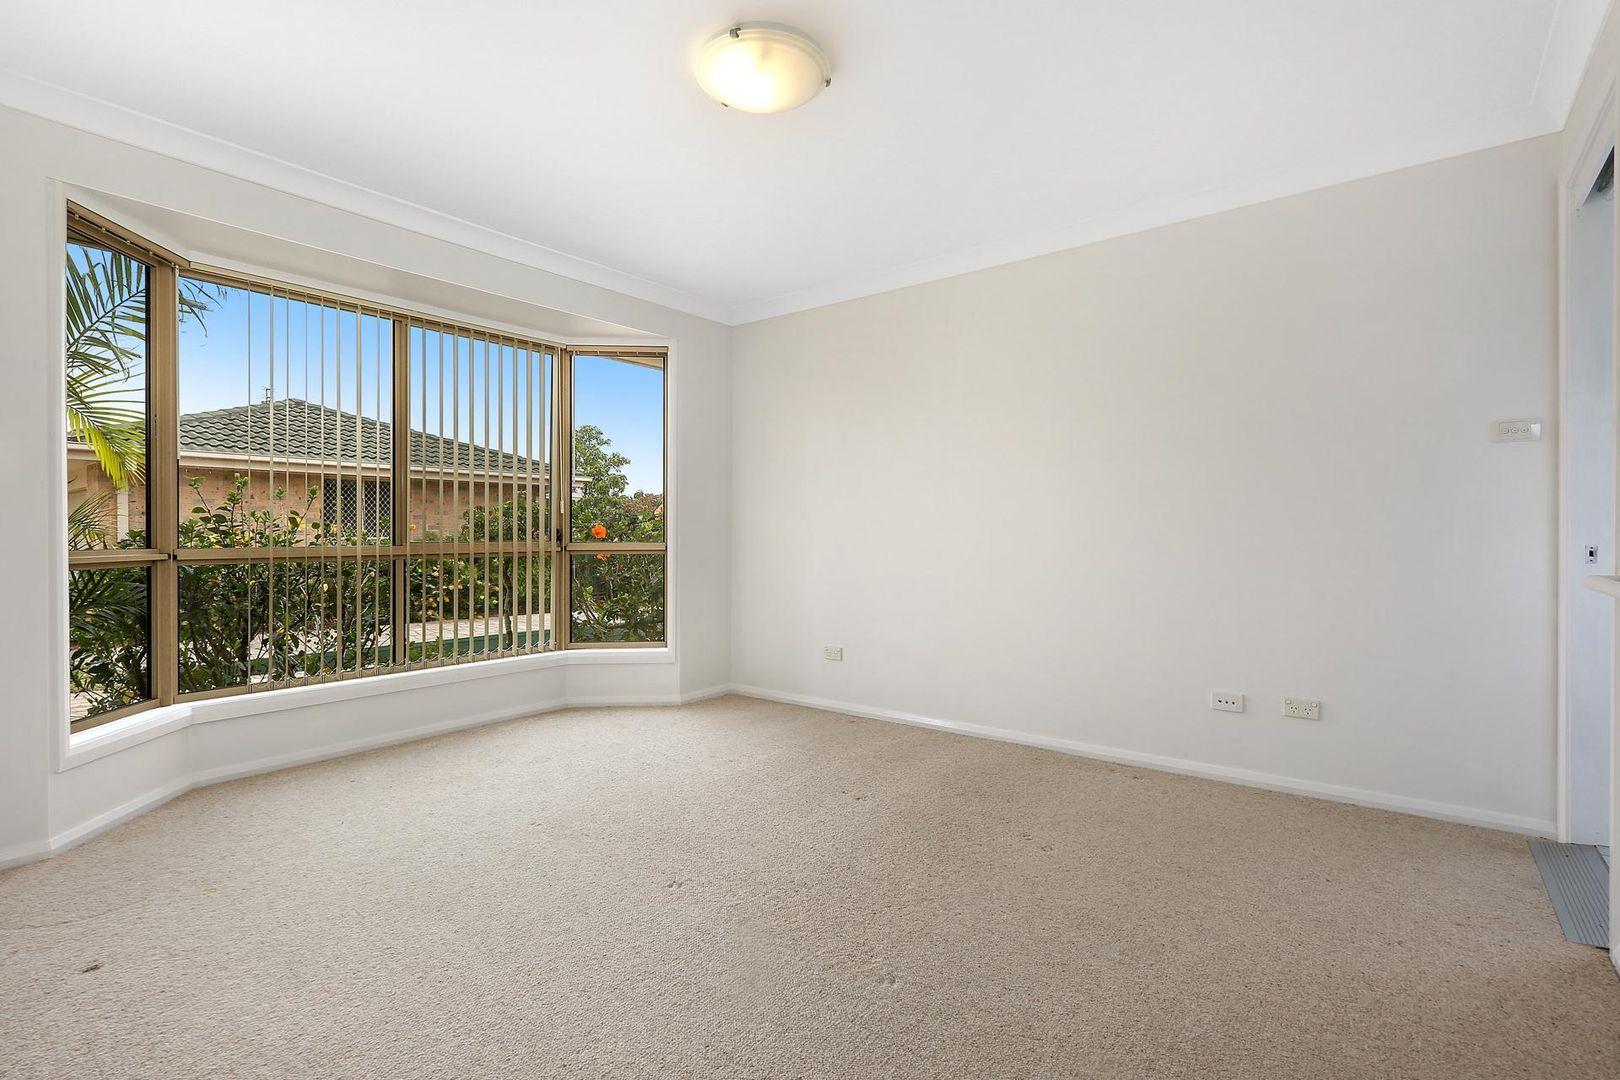 9/1 Davenport Road, Shoalhaven Heads NSW 2535, Image 2